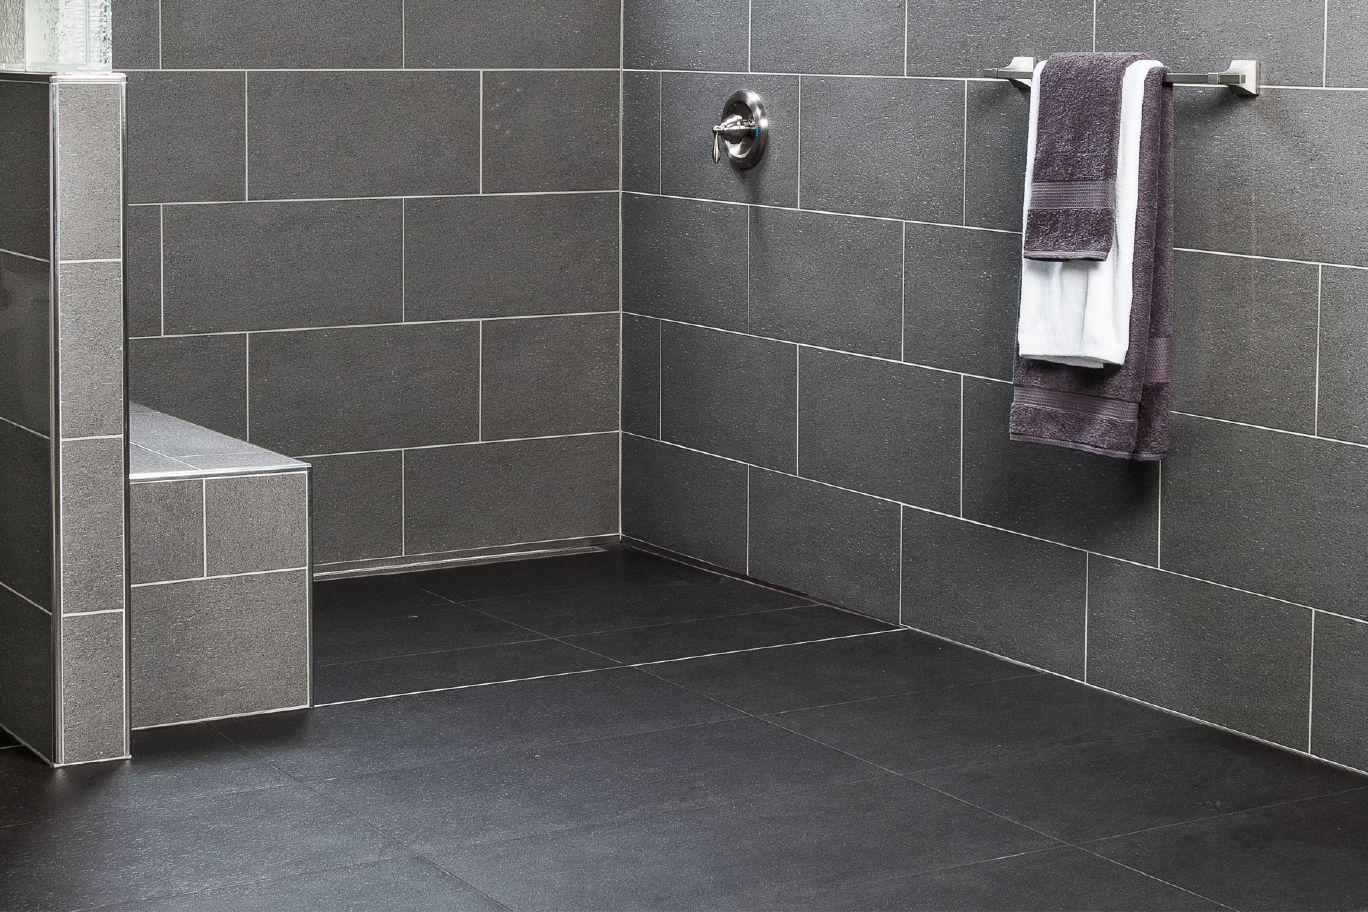 Kerdi Shower Sr With Images Linear Drain Shower Base